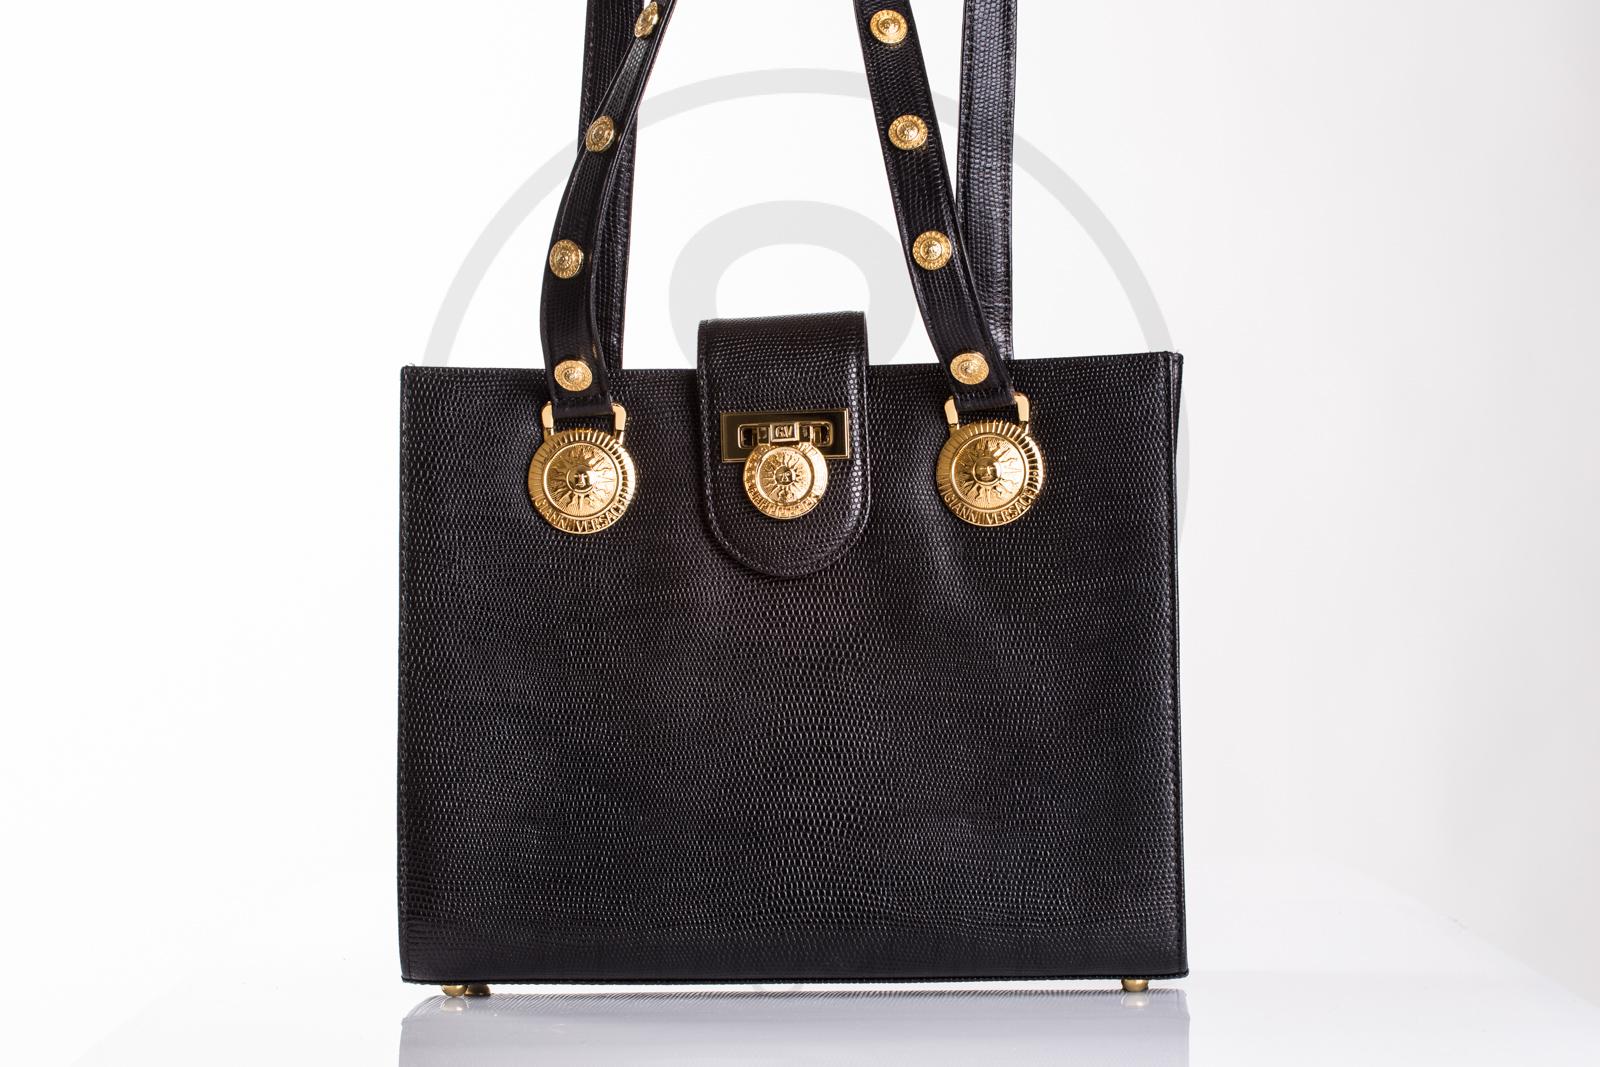 d5efdcf17489 Previous  Next. HomeSOLD OUTGianni Versace purse